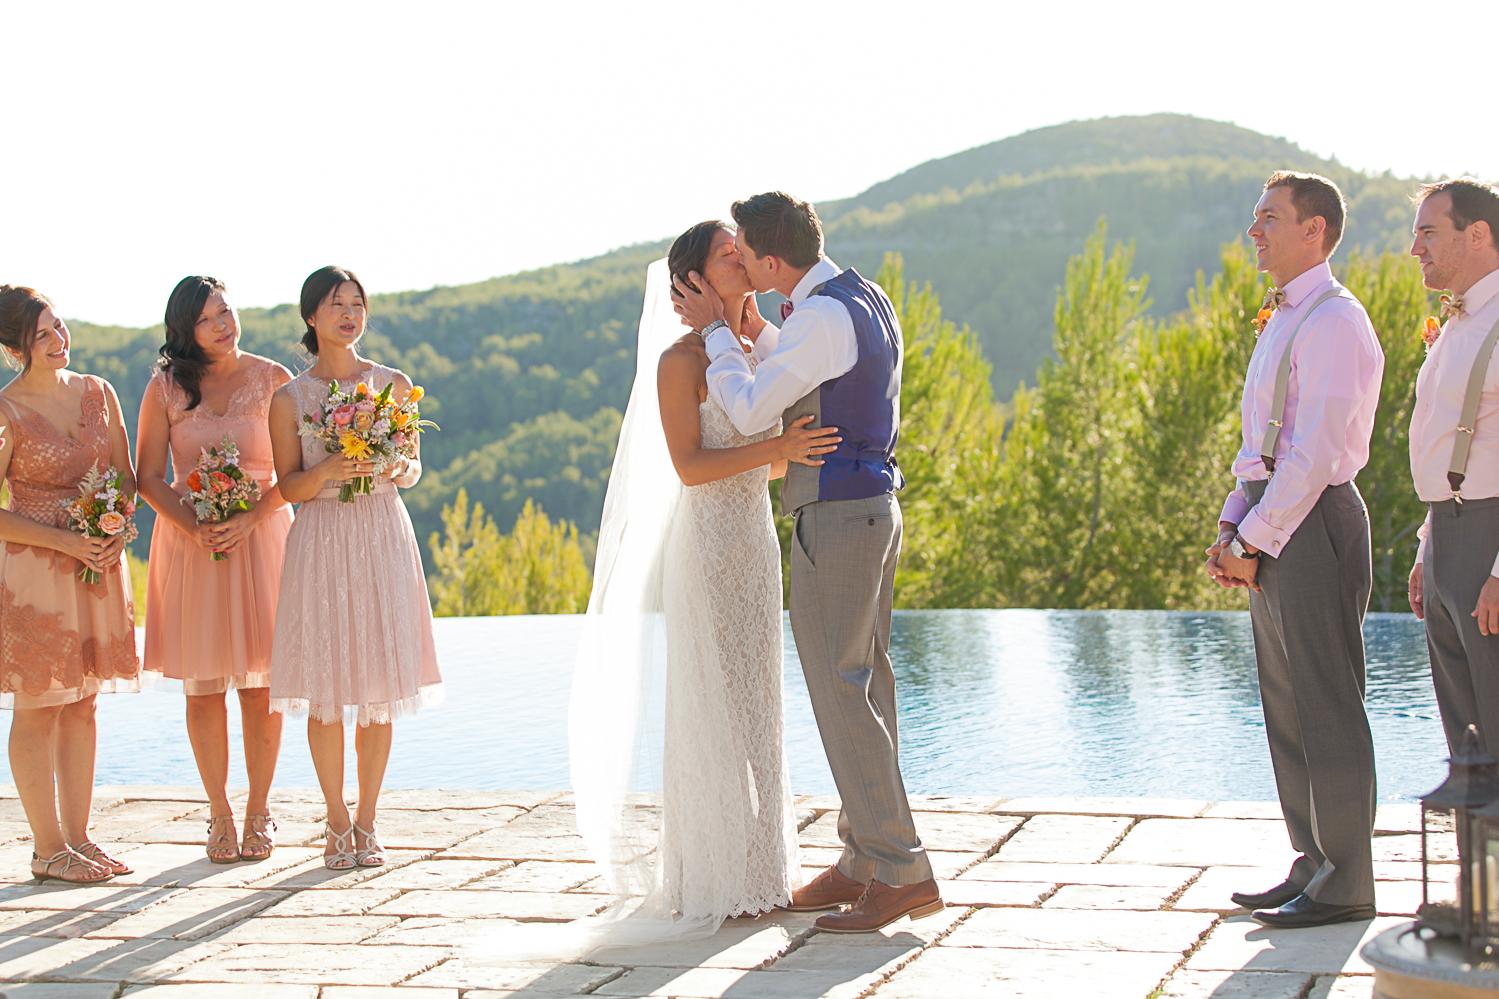 First Kiss at Villa Casanova, sitges Spain wedding